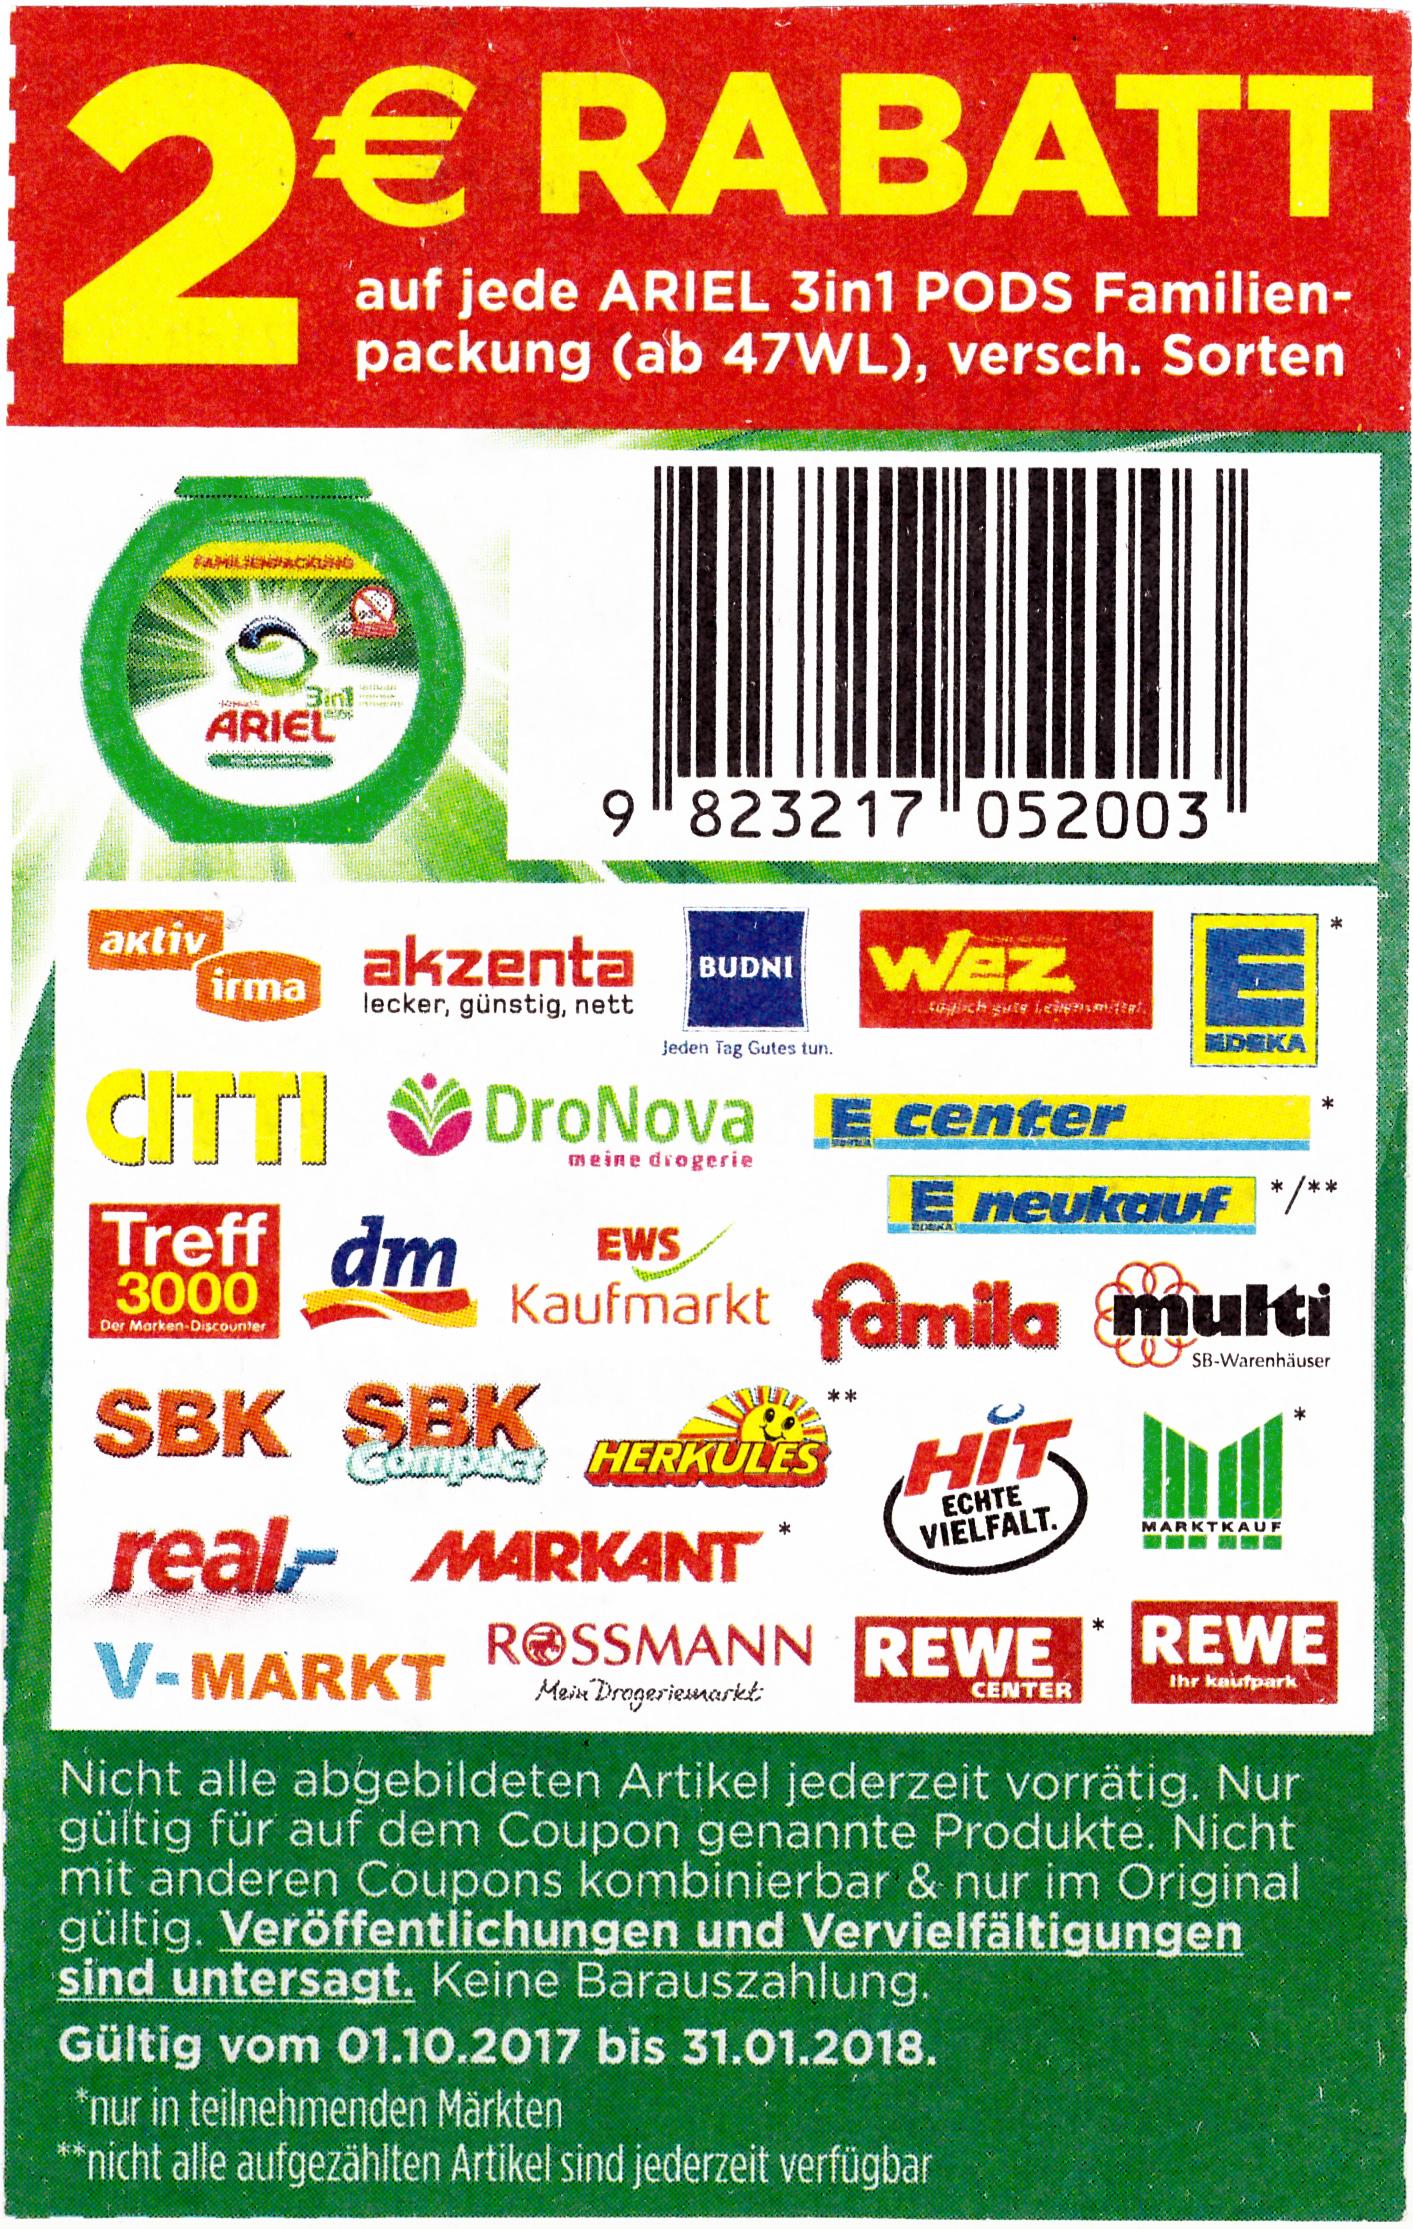 2€ Coupon/ ARIEL 3in1 PODS Familienpackung (ab 47WL)/ für Rossmann, DM, Rewe, Real usw.